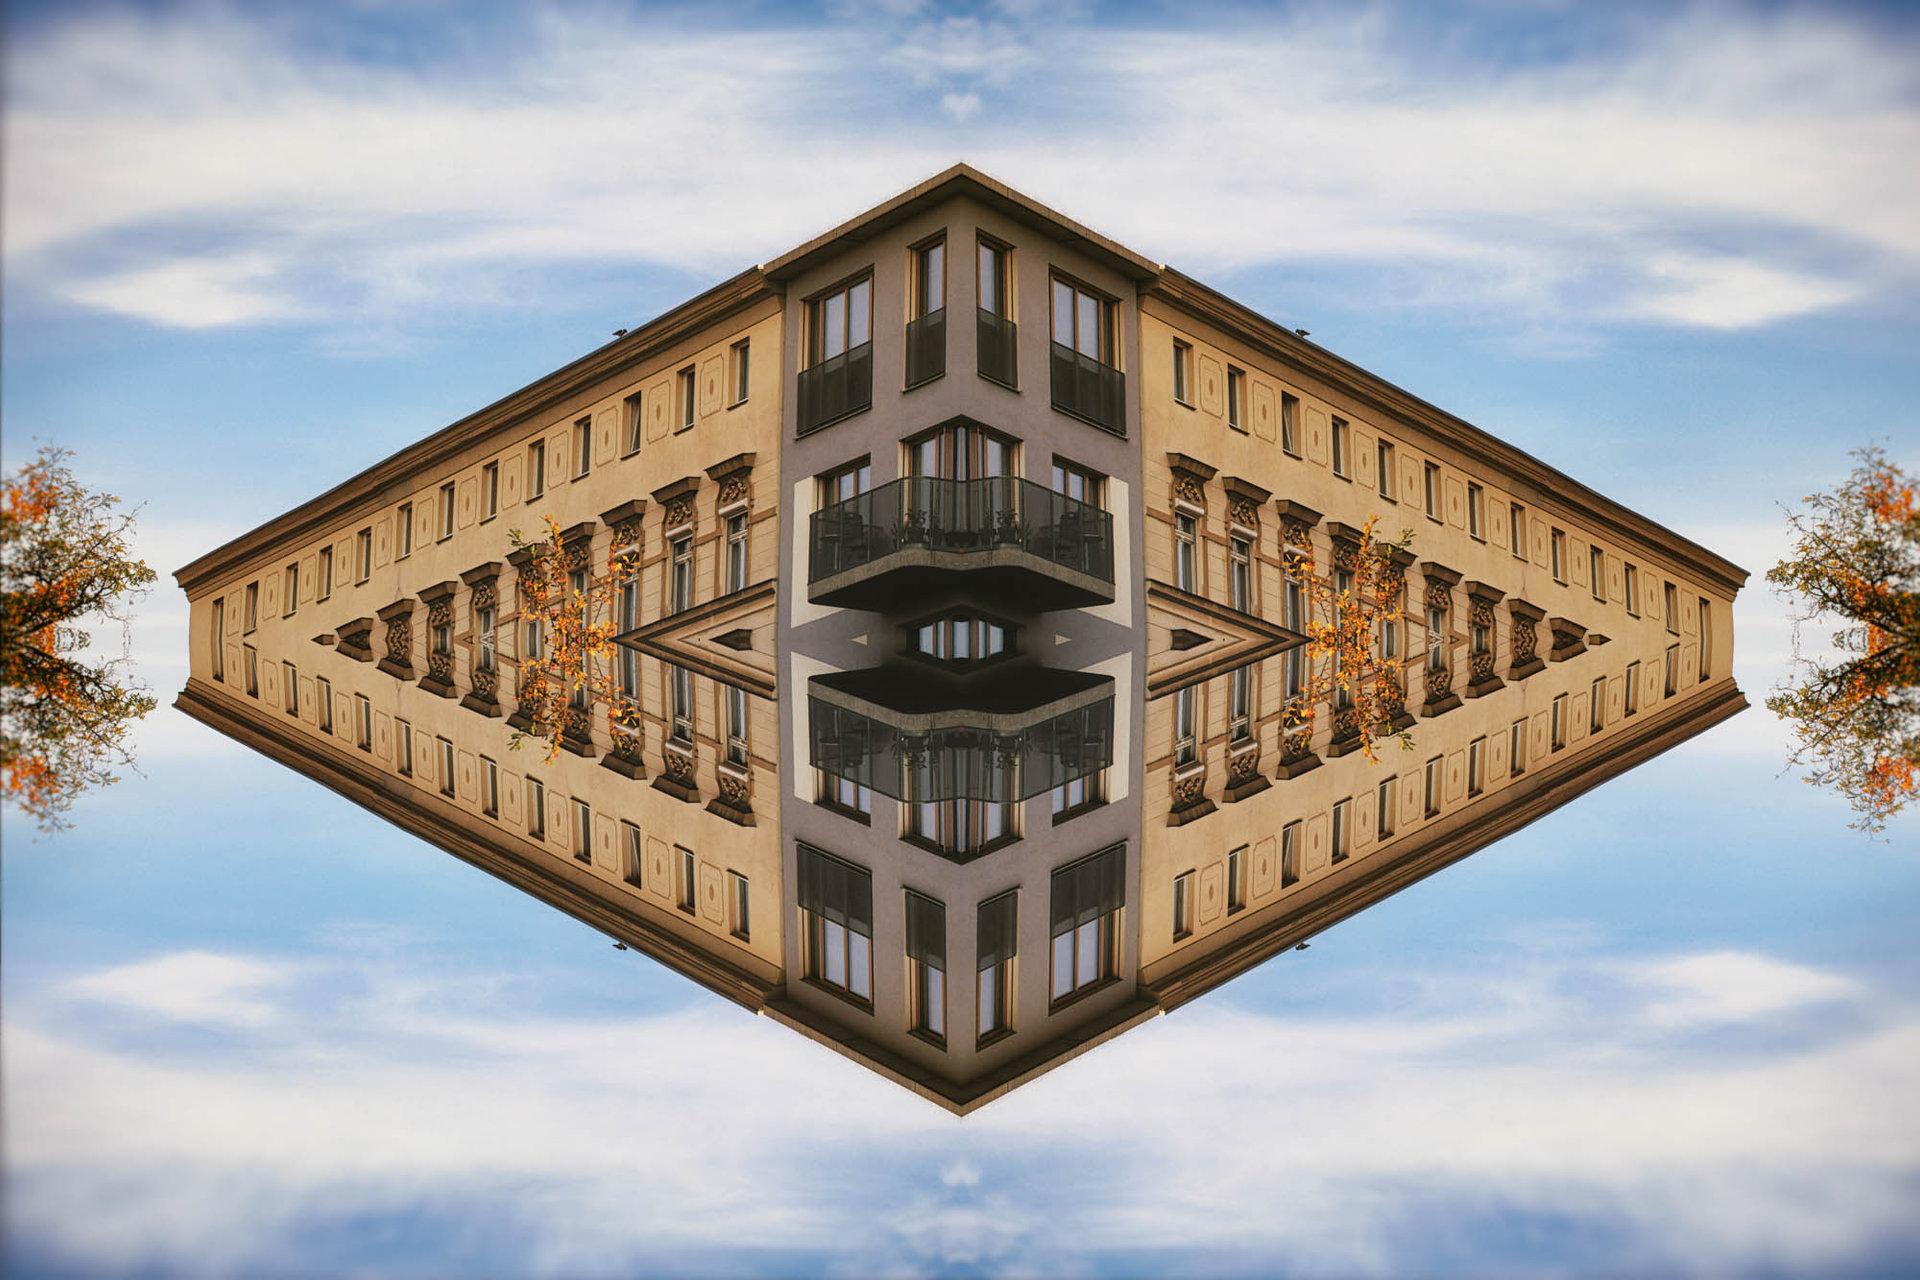 MIR - Skyfish Hotel - CLR.jpg